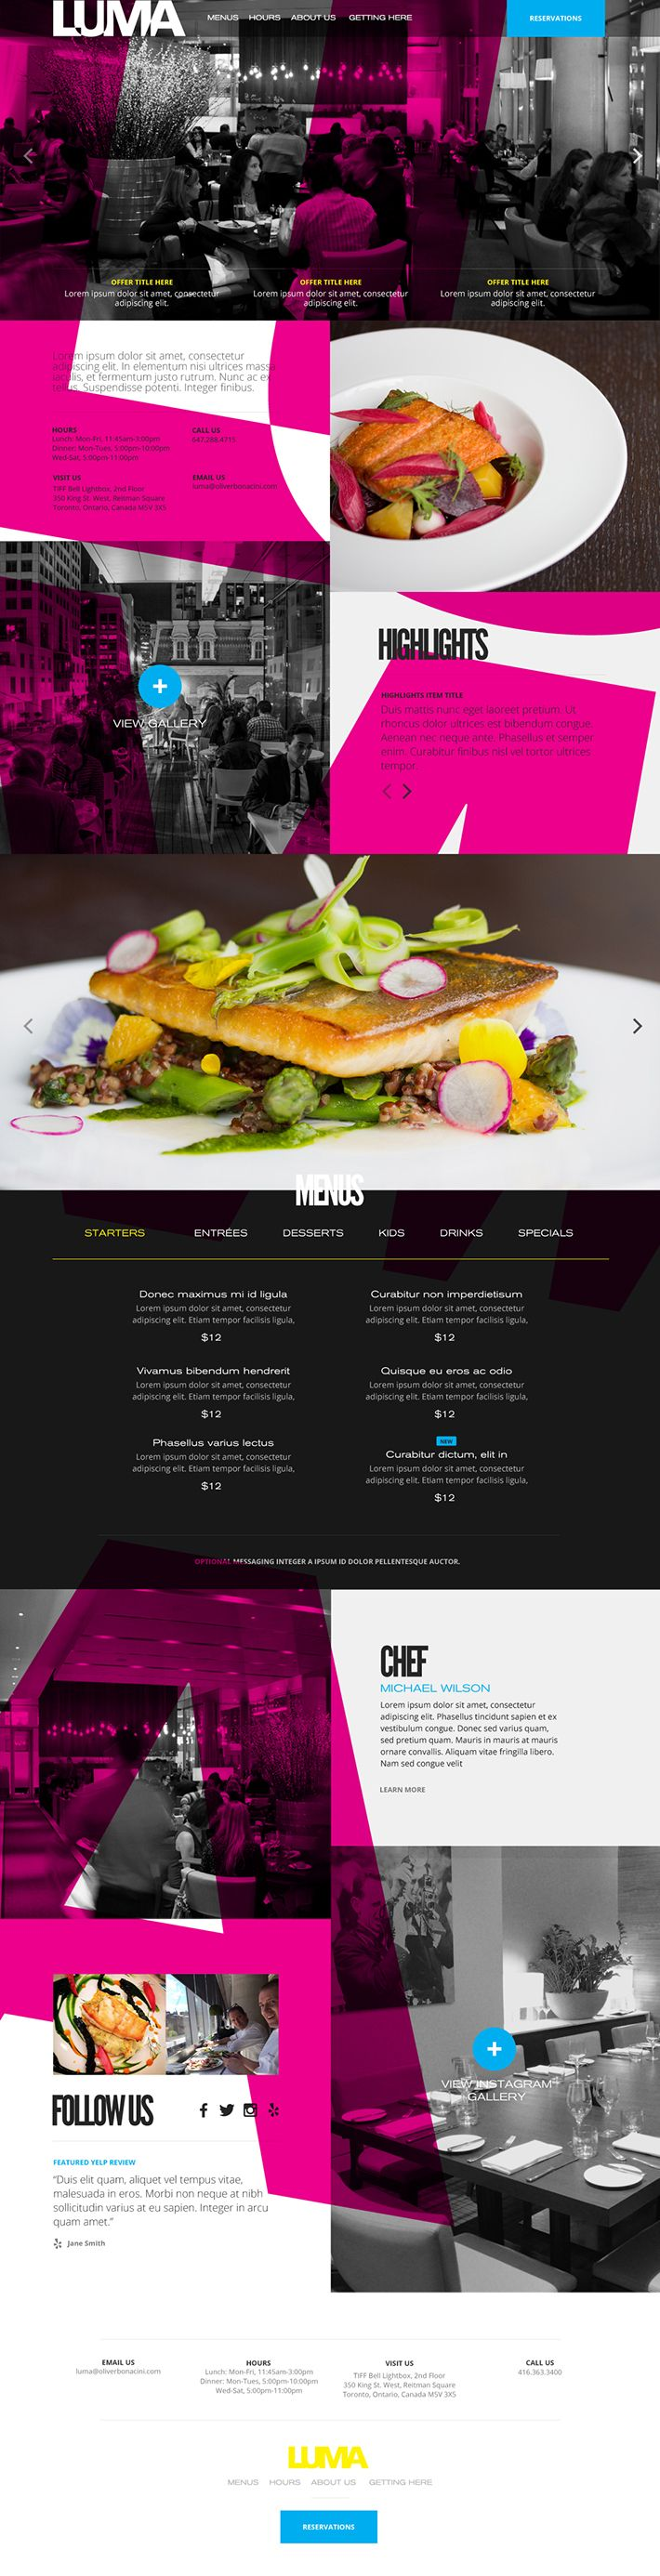 Luma Restaurant Magenta Website Concept by Agency Dominion on Behance